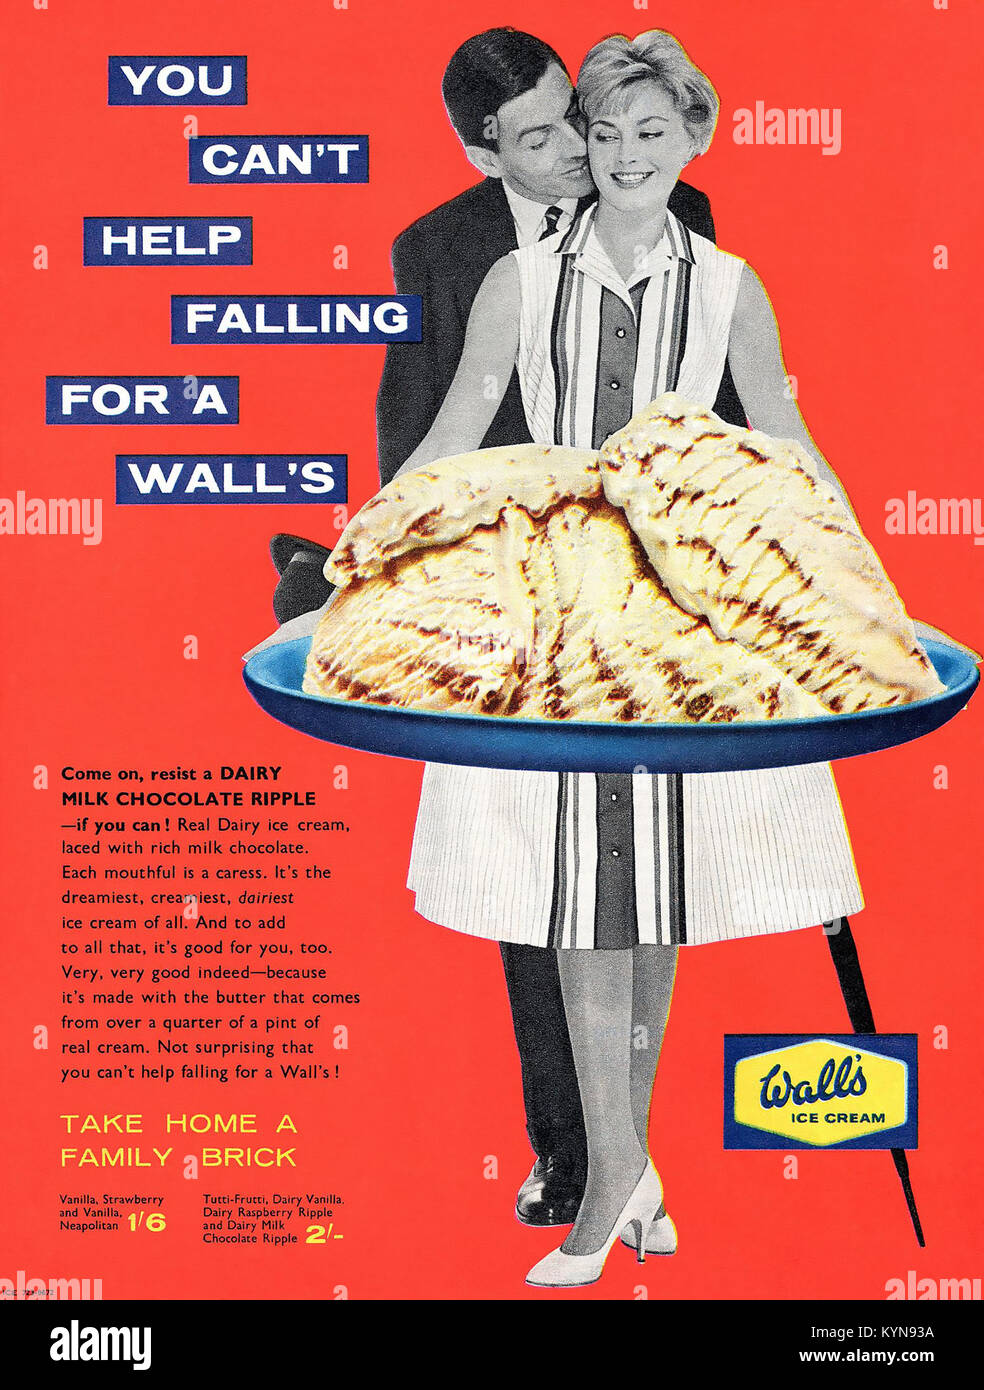 WALL'S ICE CREAM ADVERTS 1950s - Stock Image